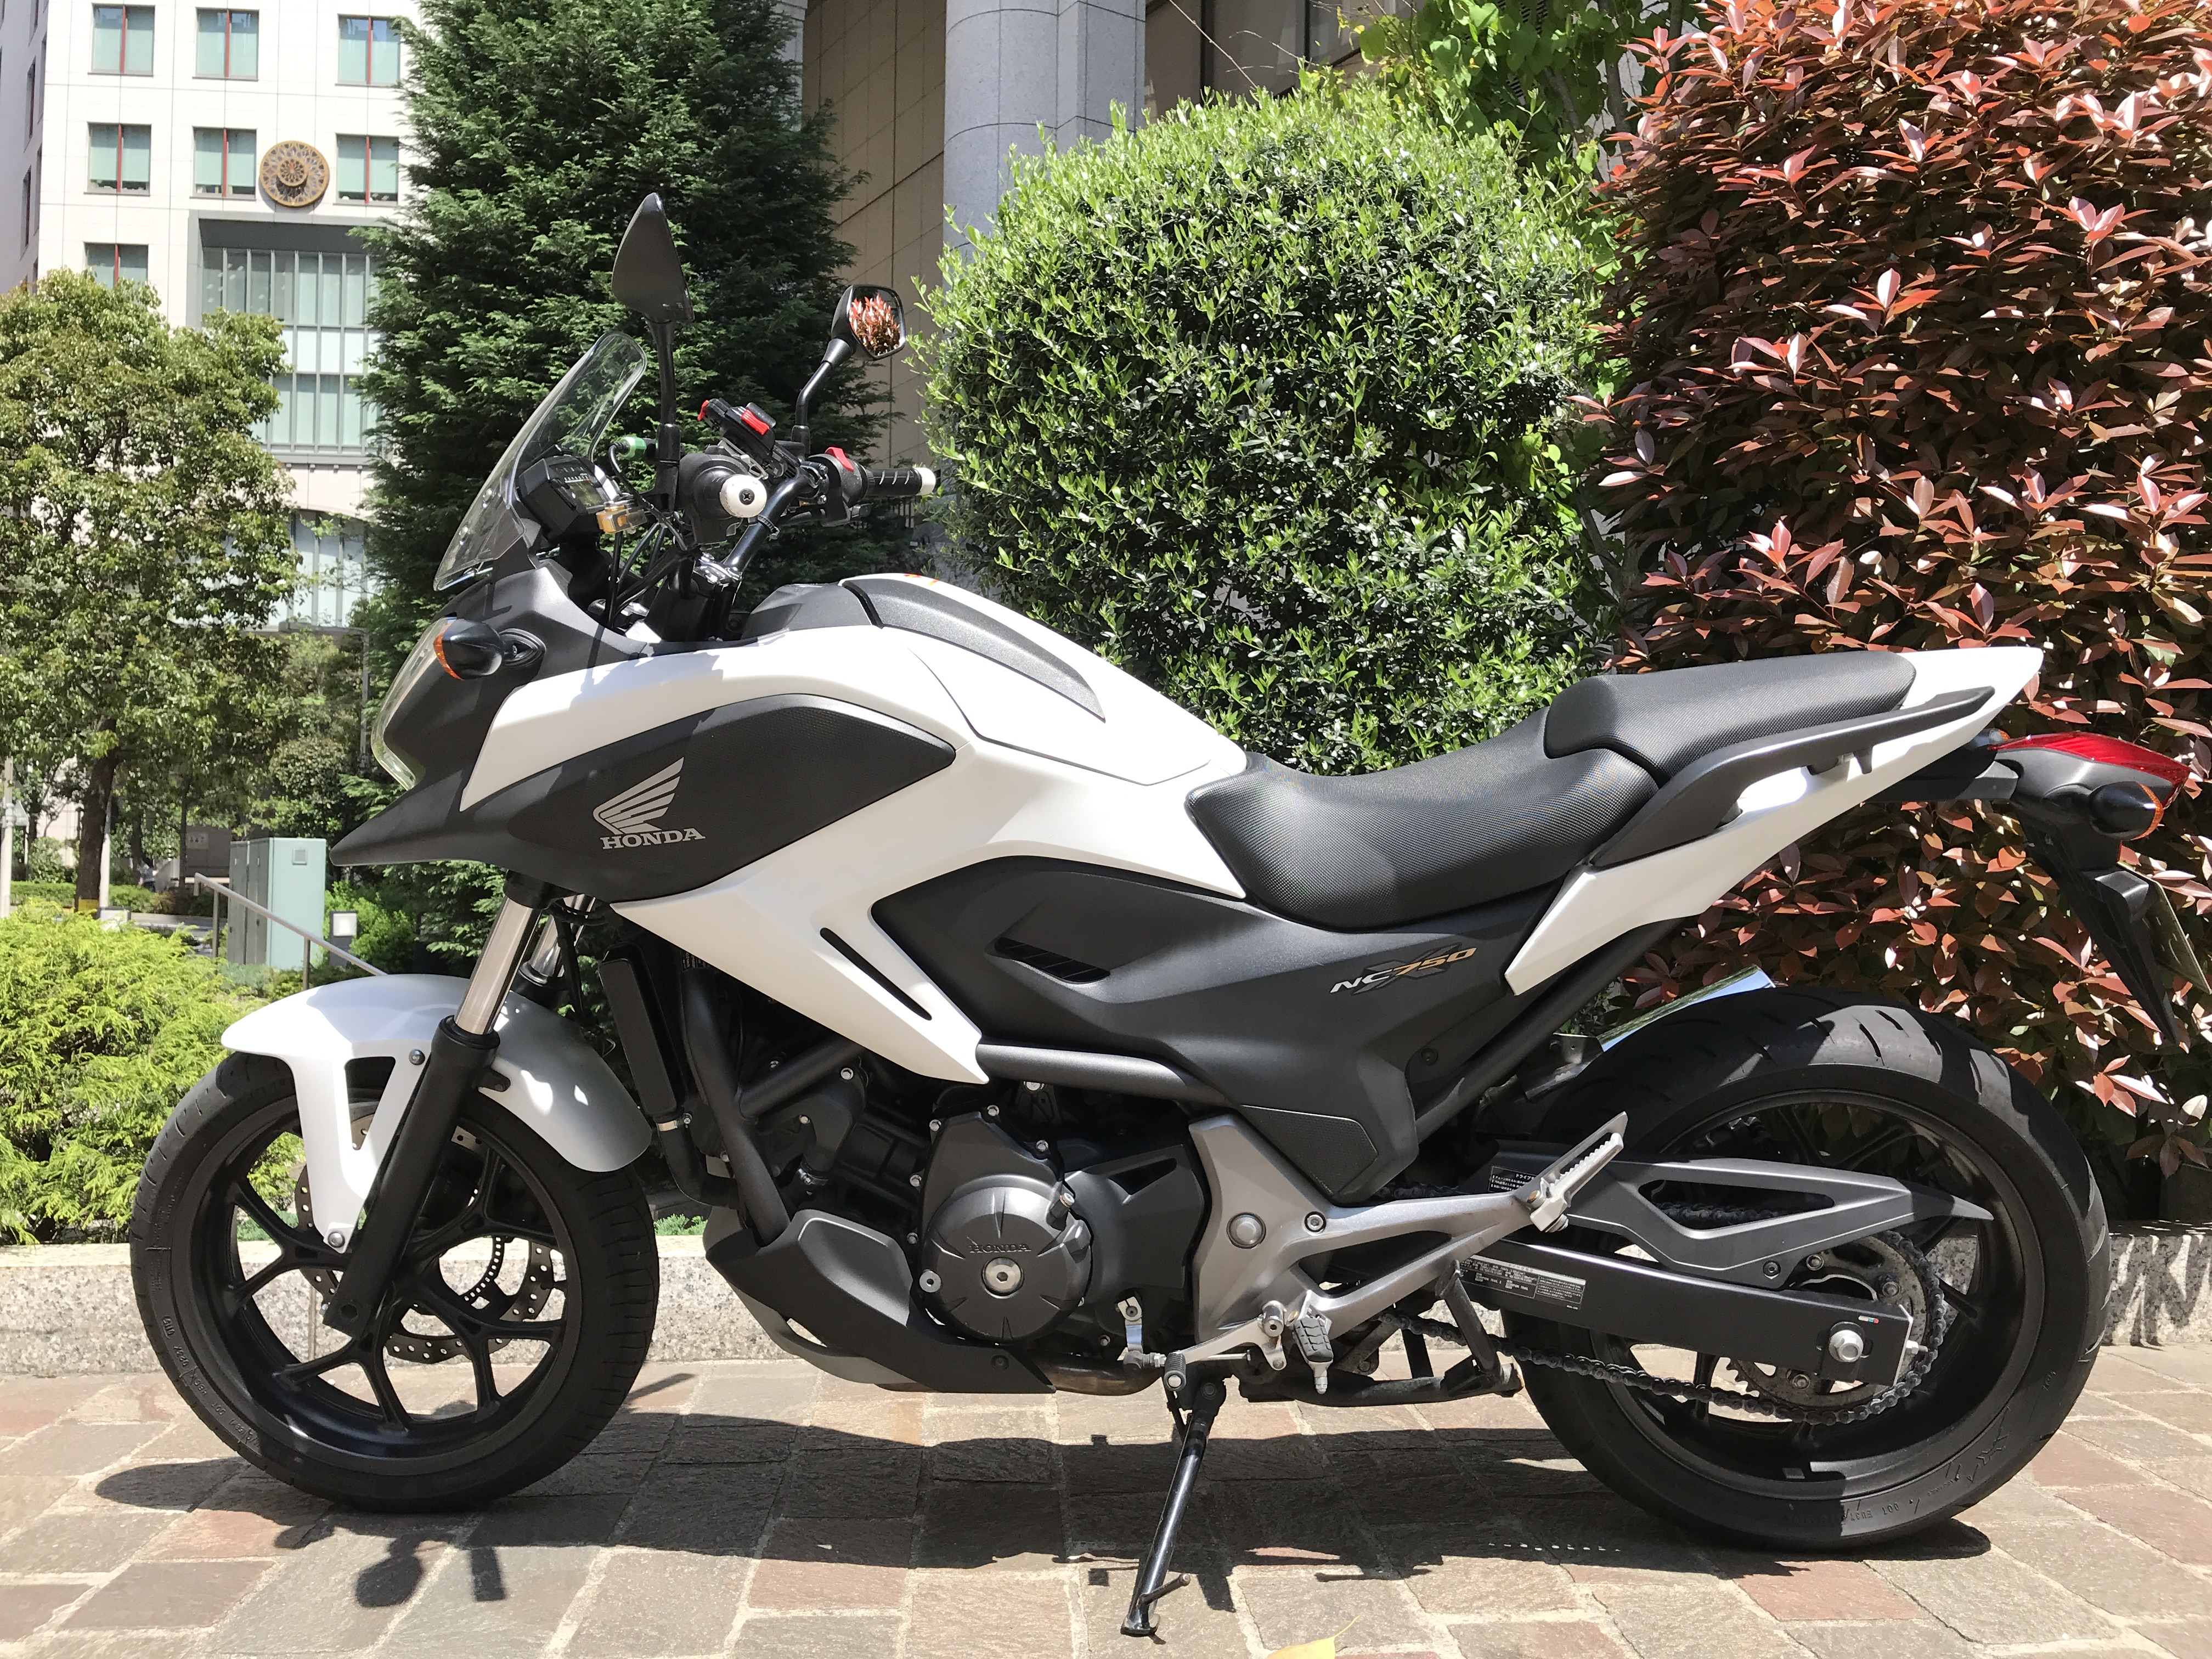 NC750X (HN-00) - 【公式】レンタルバイクのベストBike® 仲町台駅前